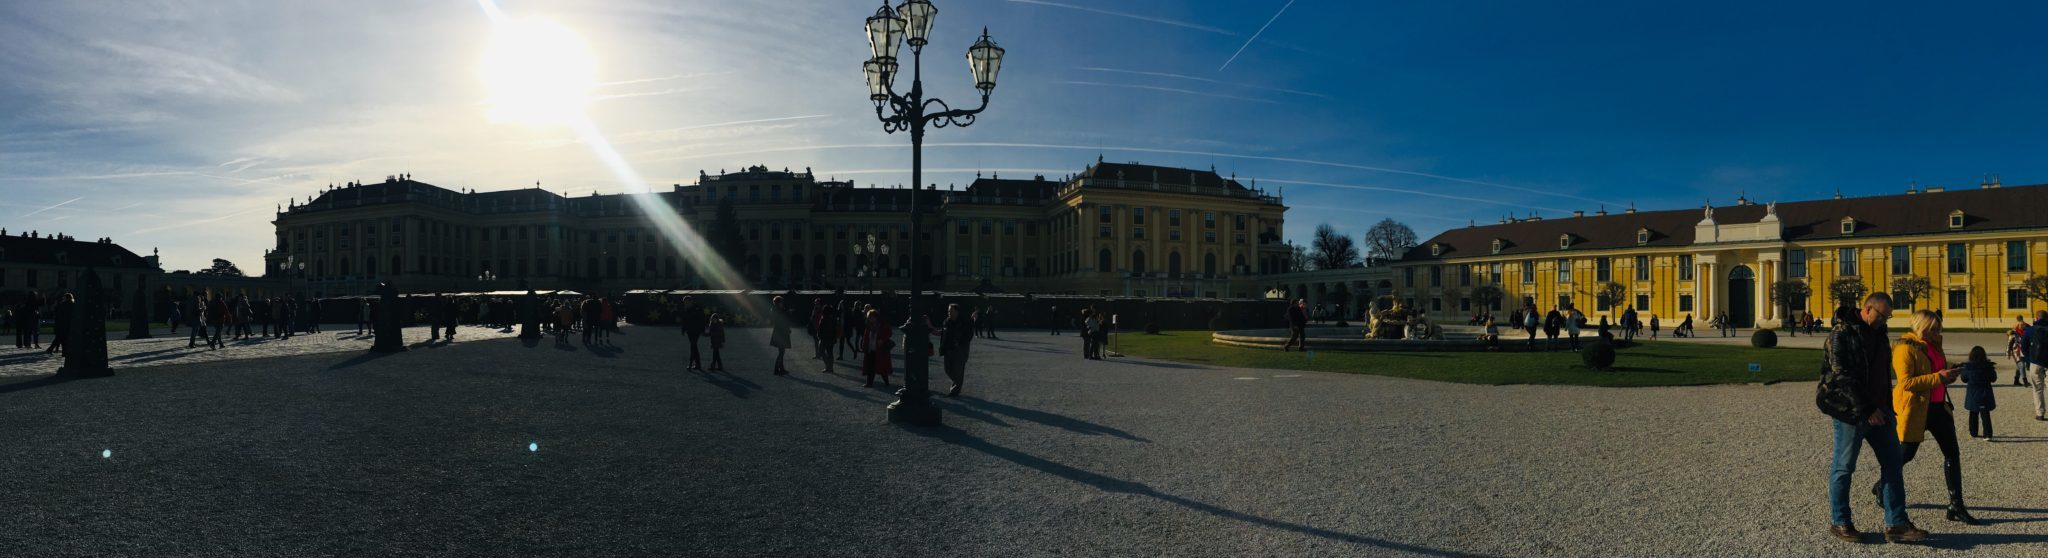 lolanoviajasola viena palacio